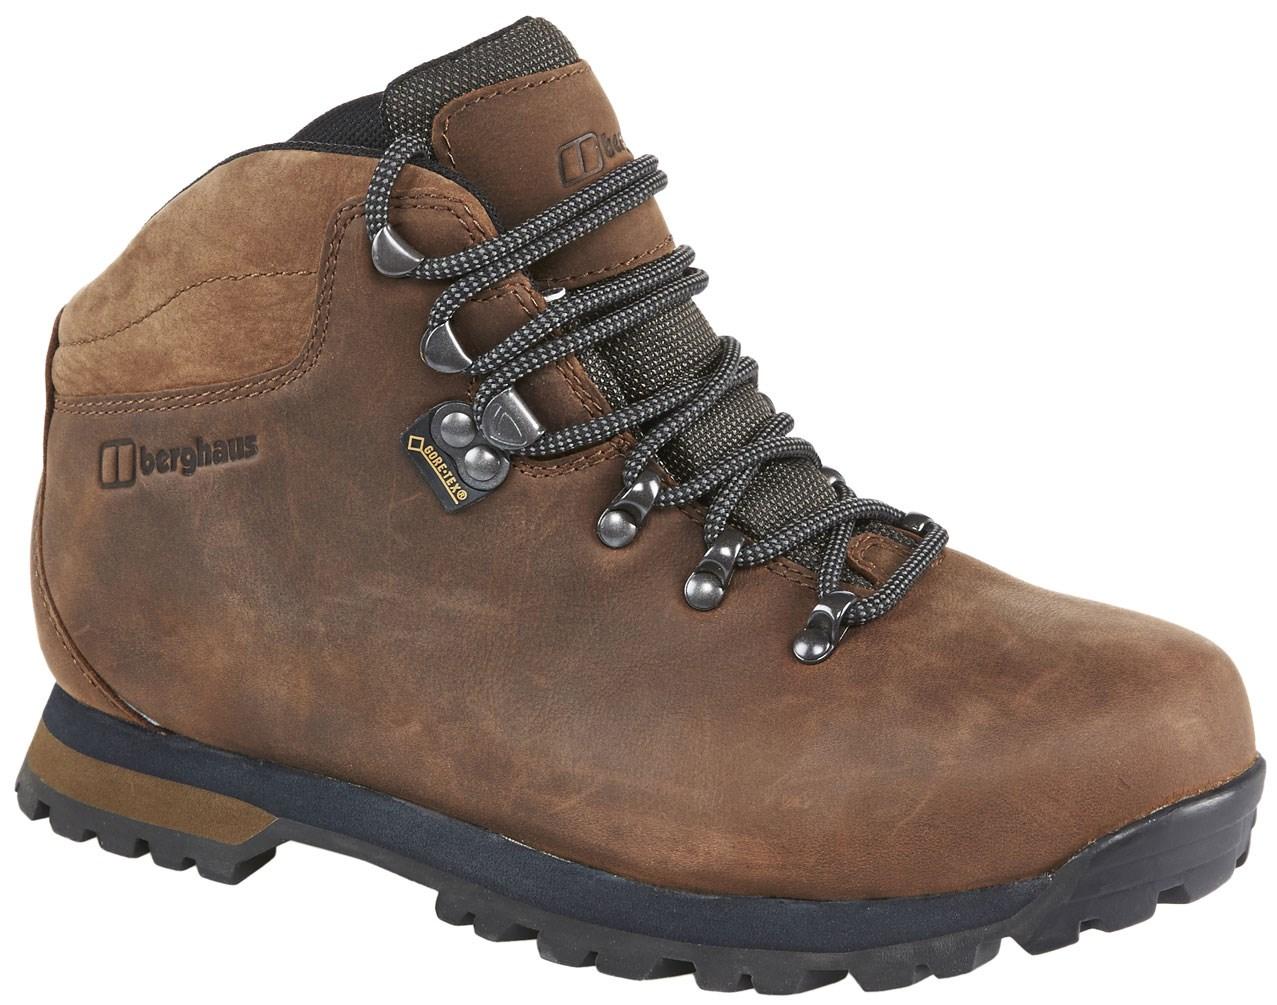 waterproof walking boots preload COSWNIR